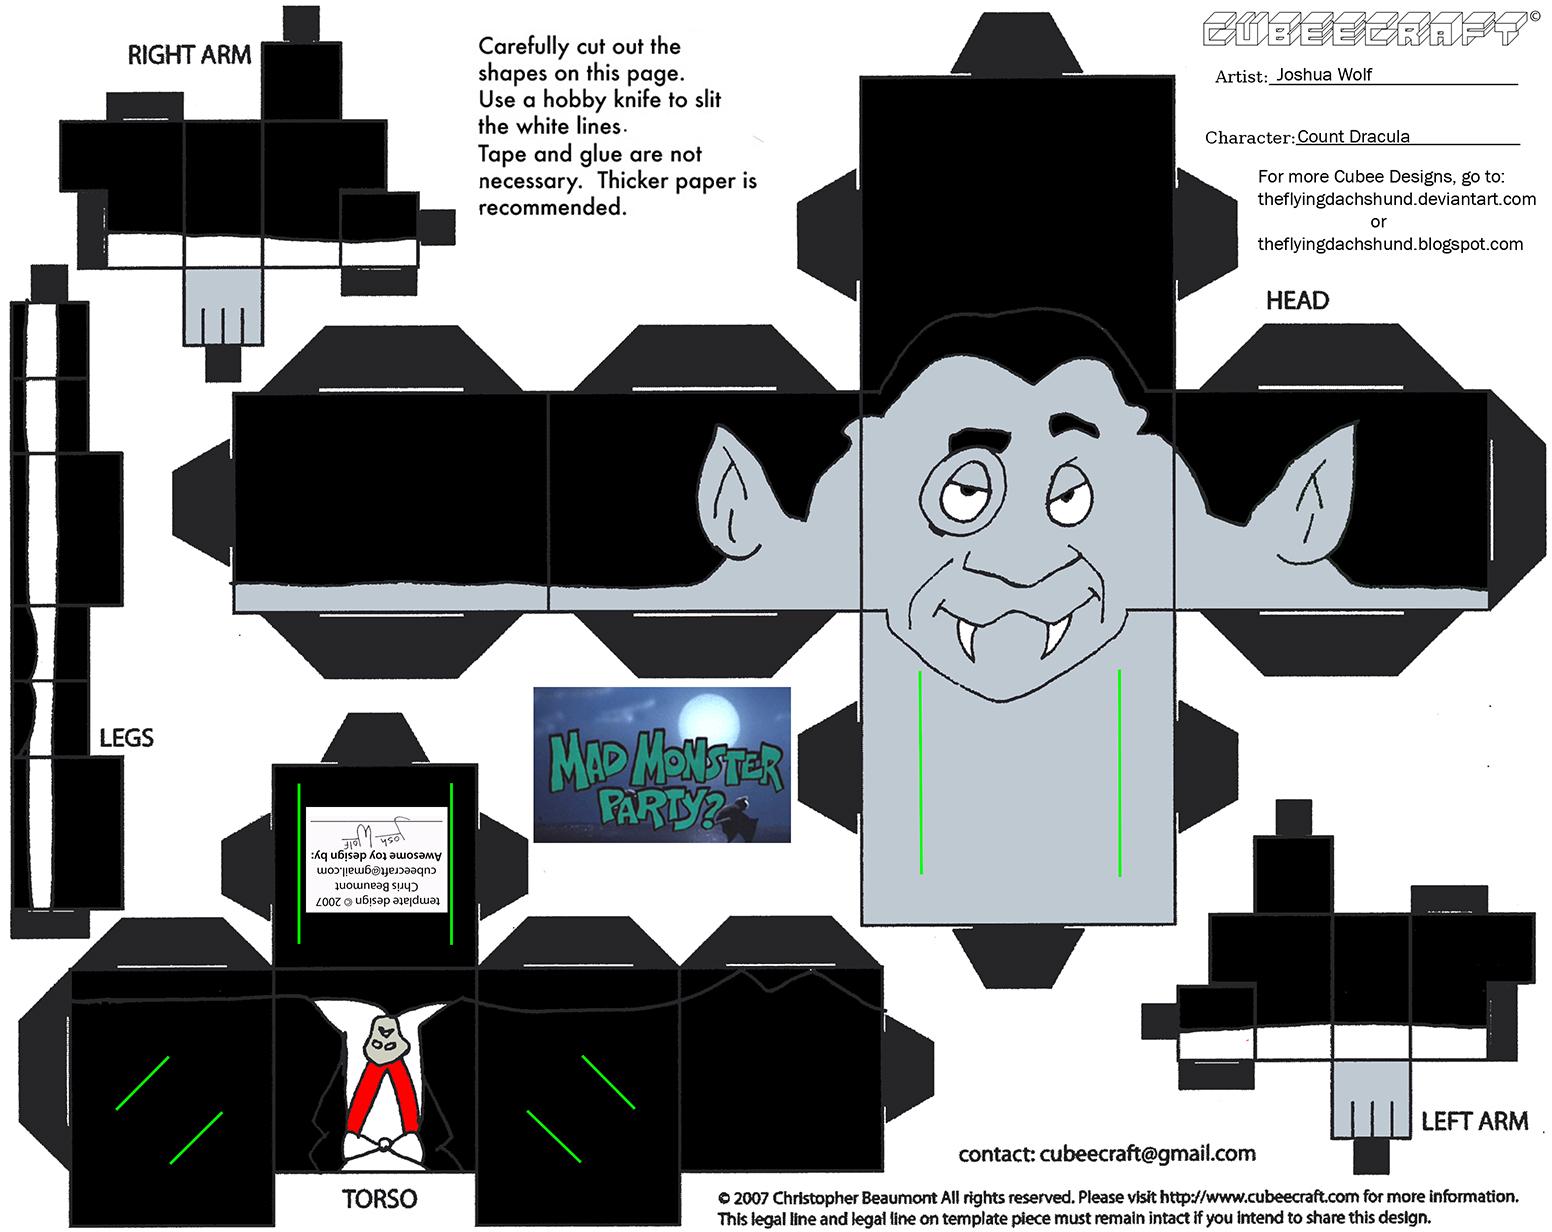 MMP2: Count Dracula Cubee